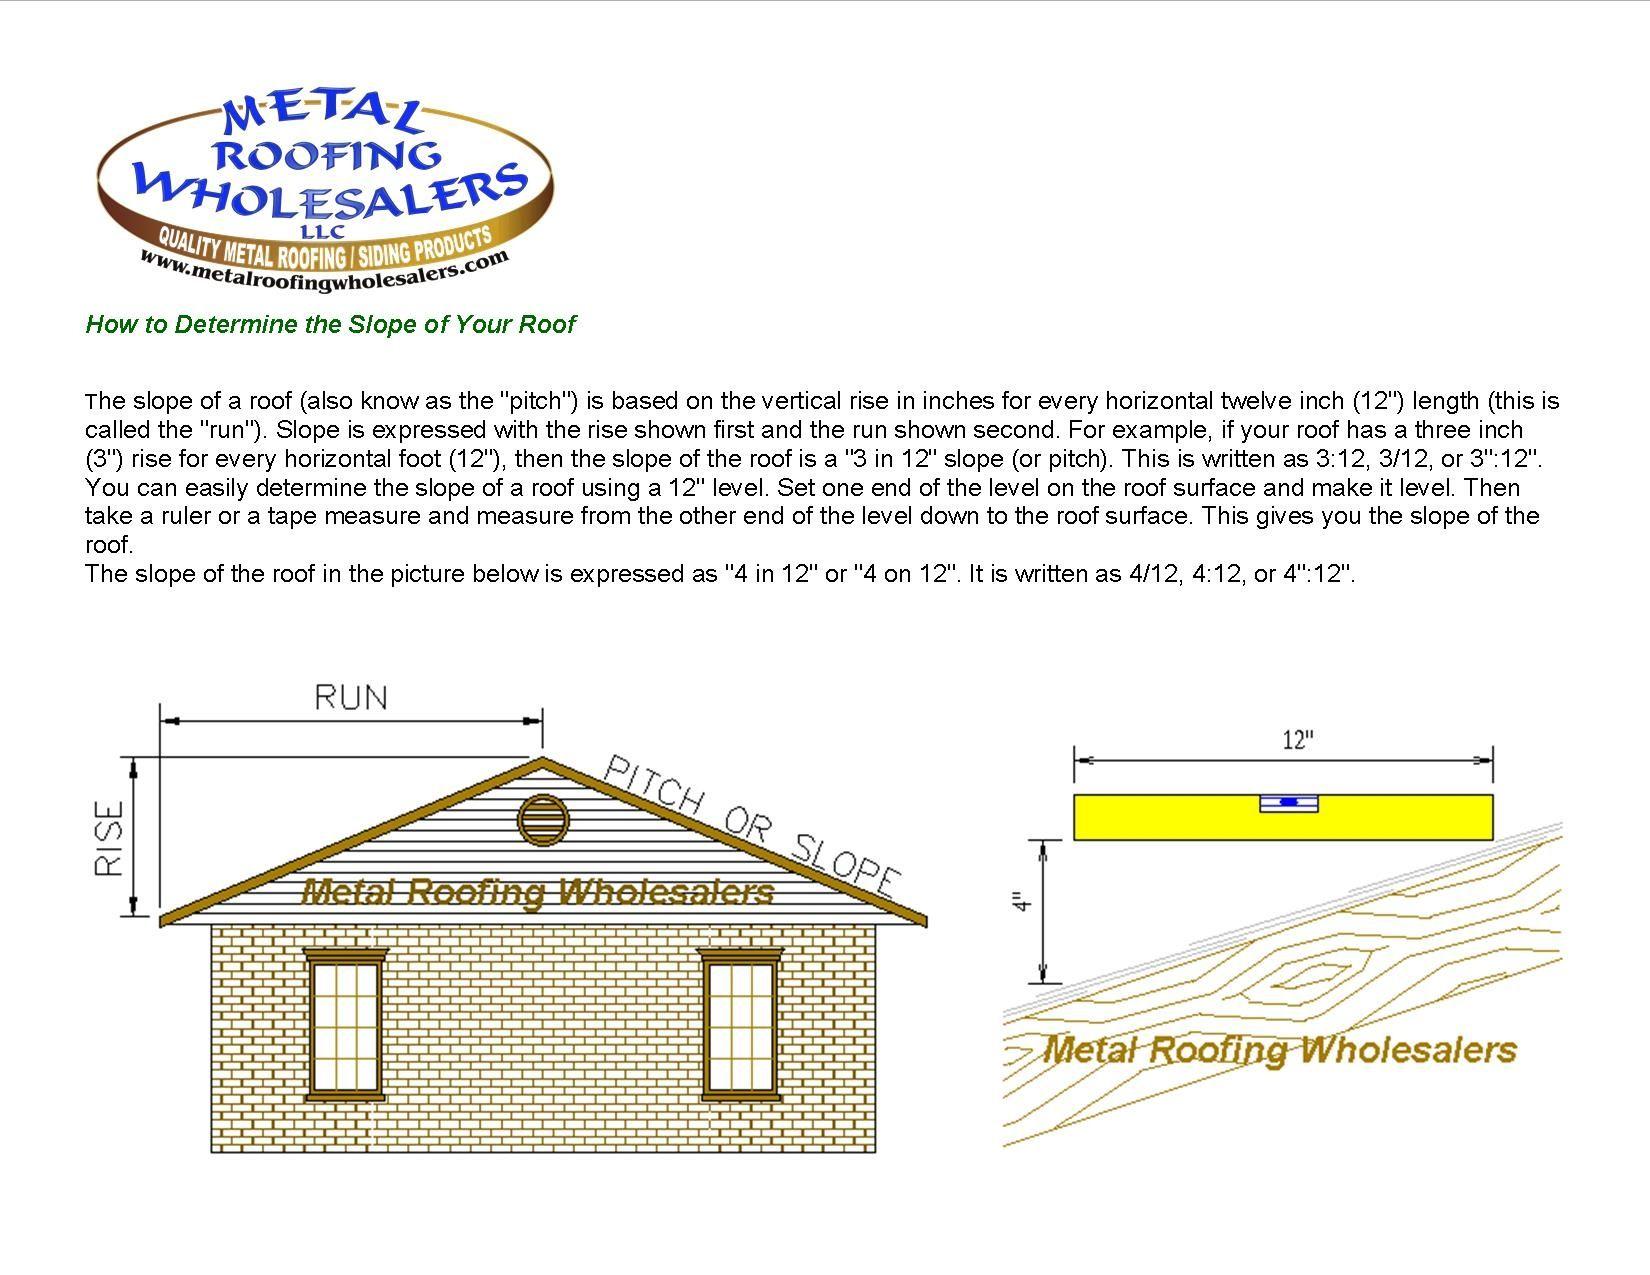 26 Gauge Metal Roof Thickness Madera, Estructuras de